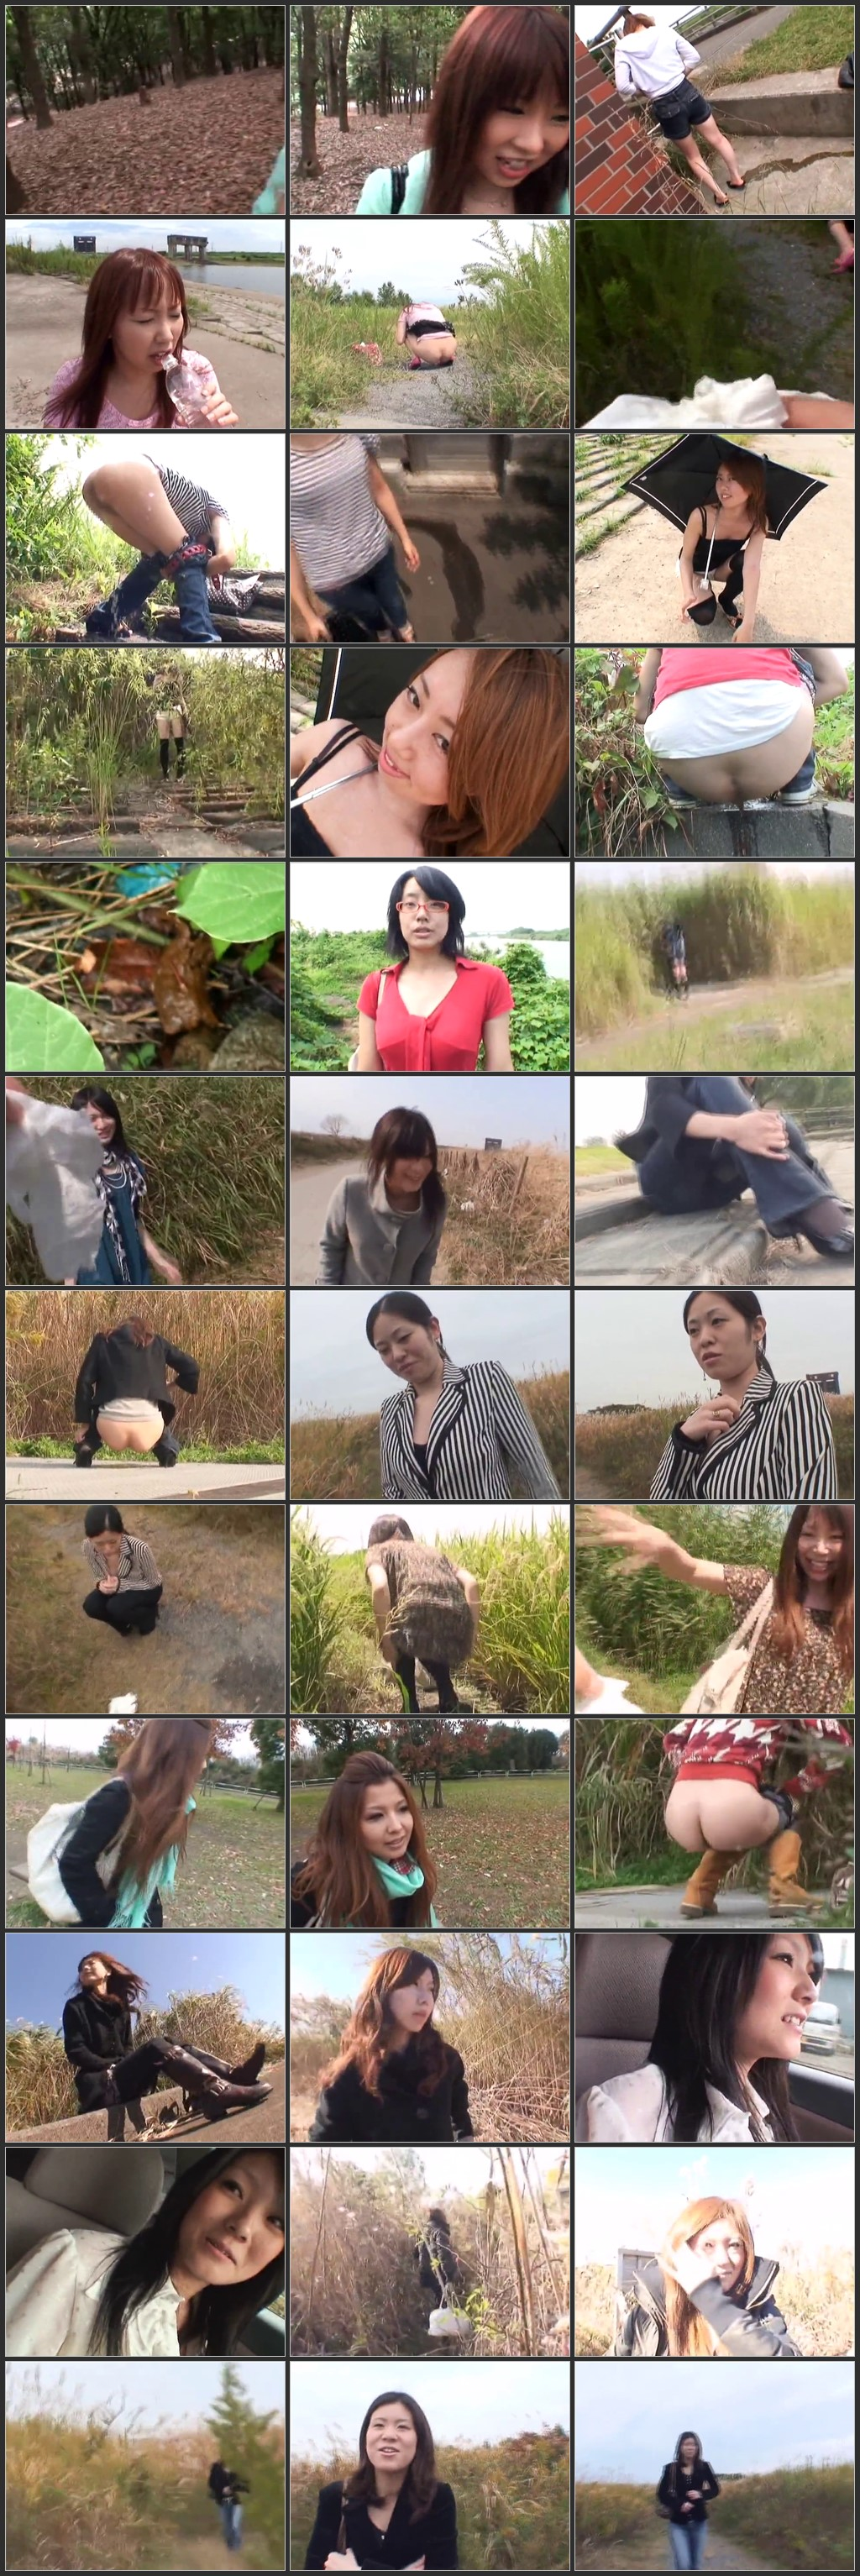 EWAZ 017 B - [EWAZ-017] 実録!! 女友達の野グソ野しょんDX 2 4時間 放尿 Exposure MANIAスカトロ ワケあり